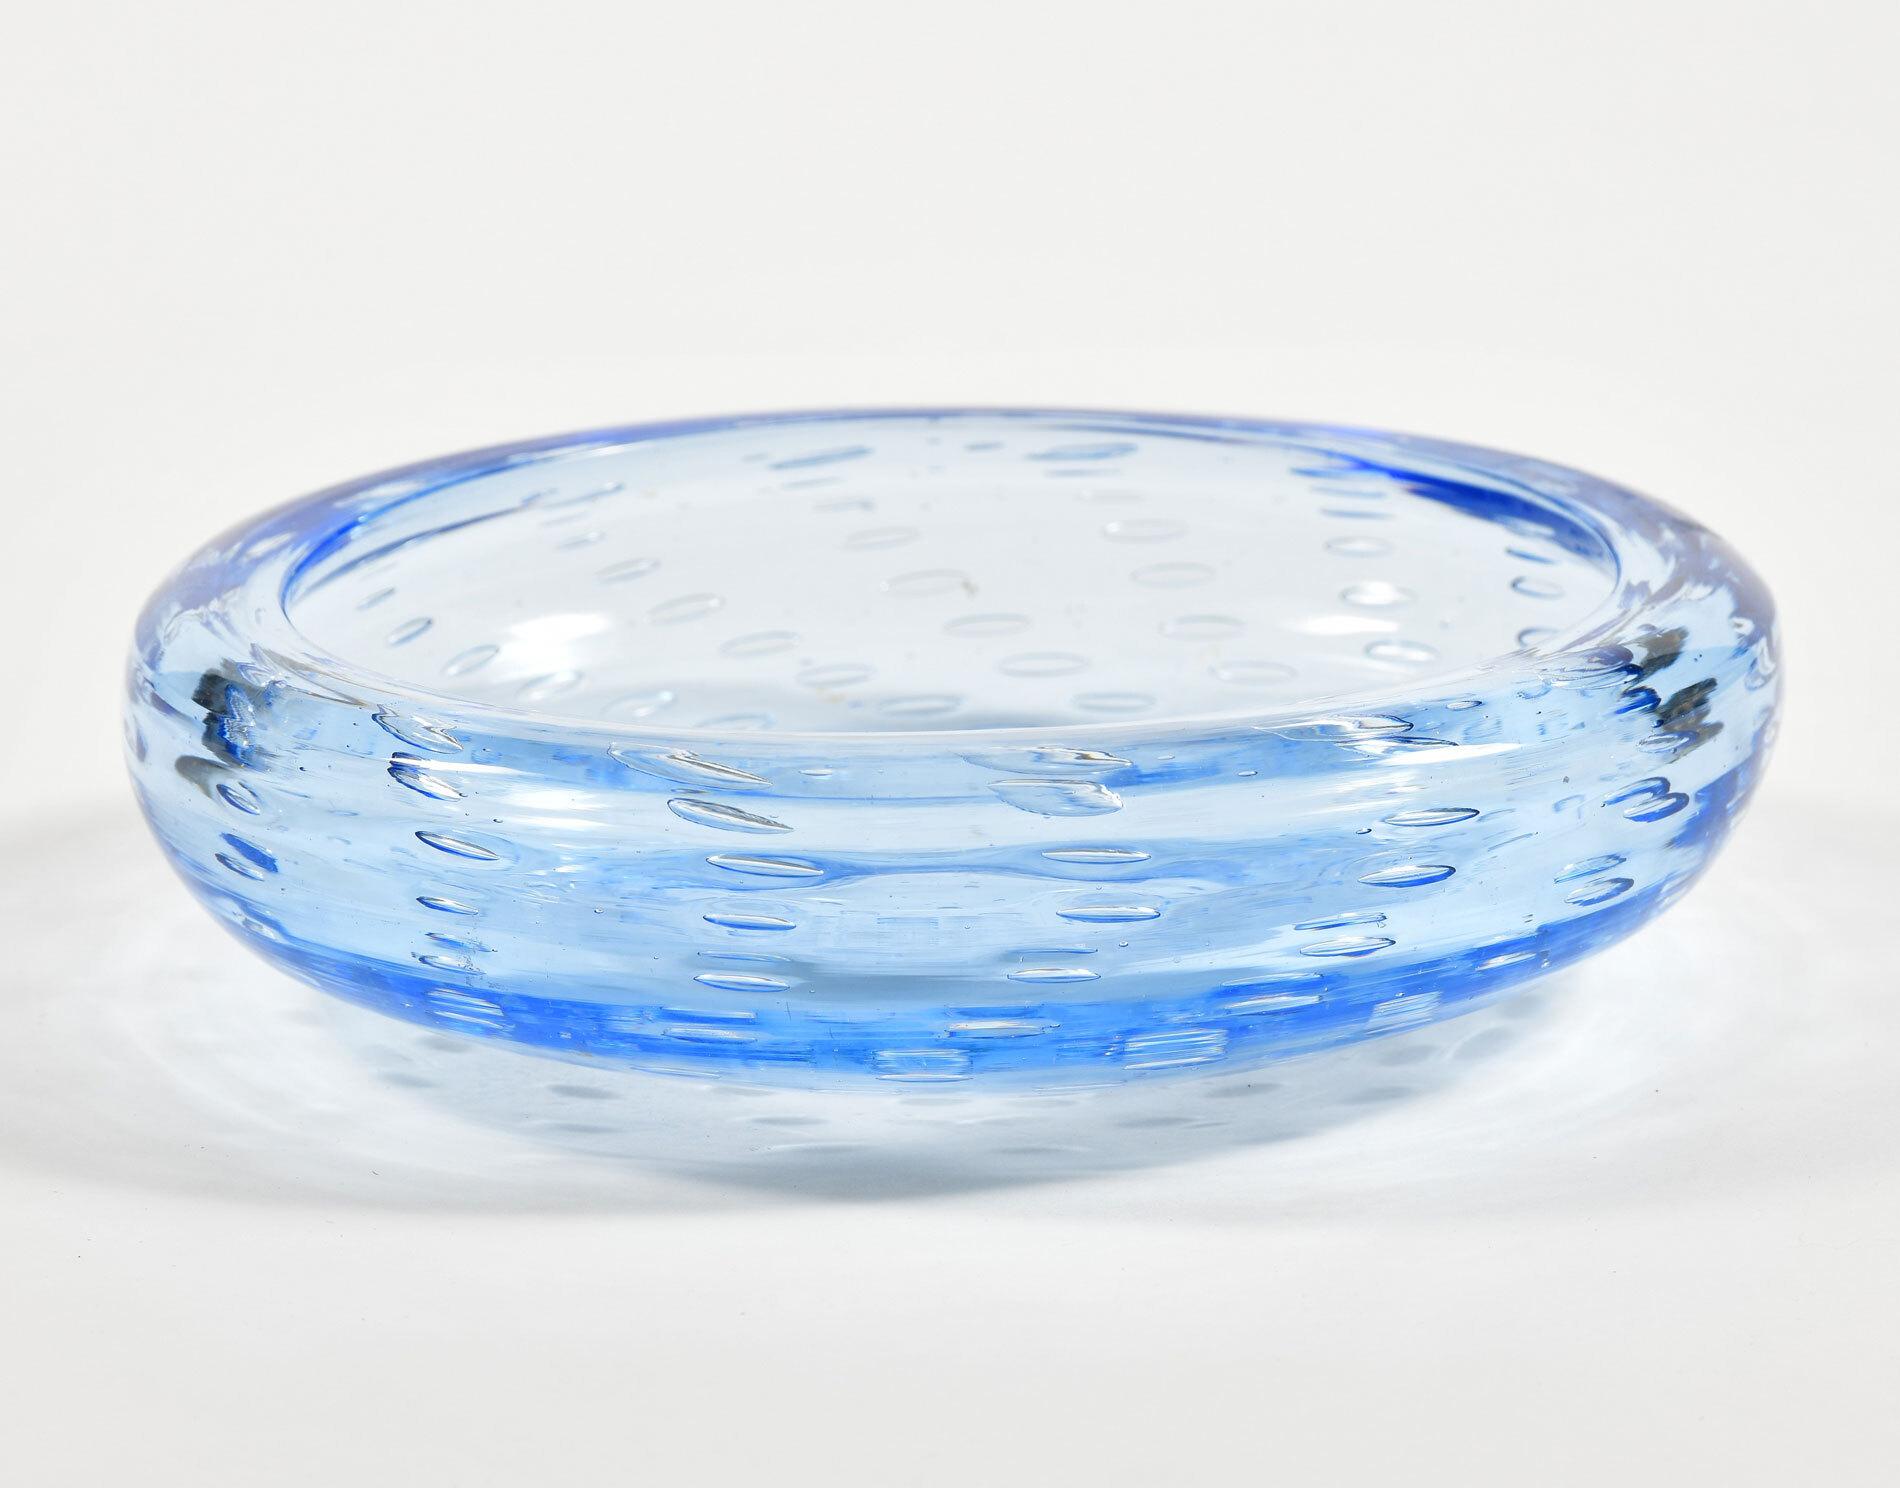 Mid Centruy Blue Murano Bowl 02